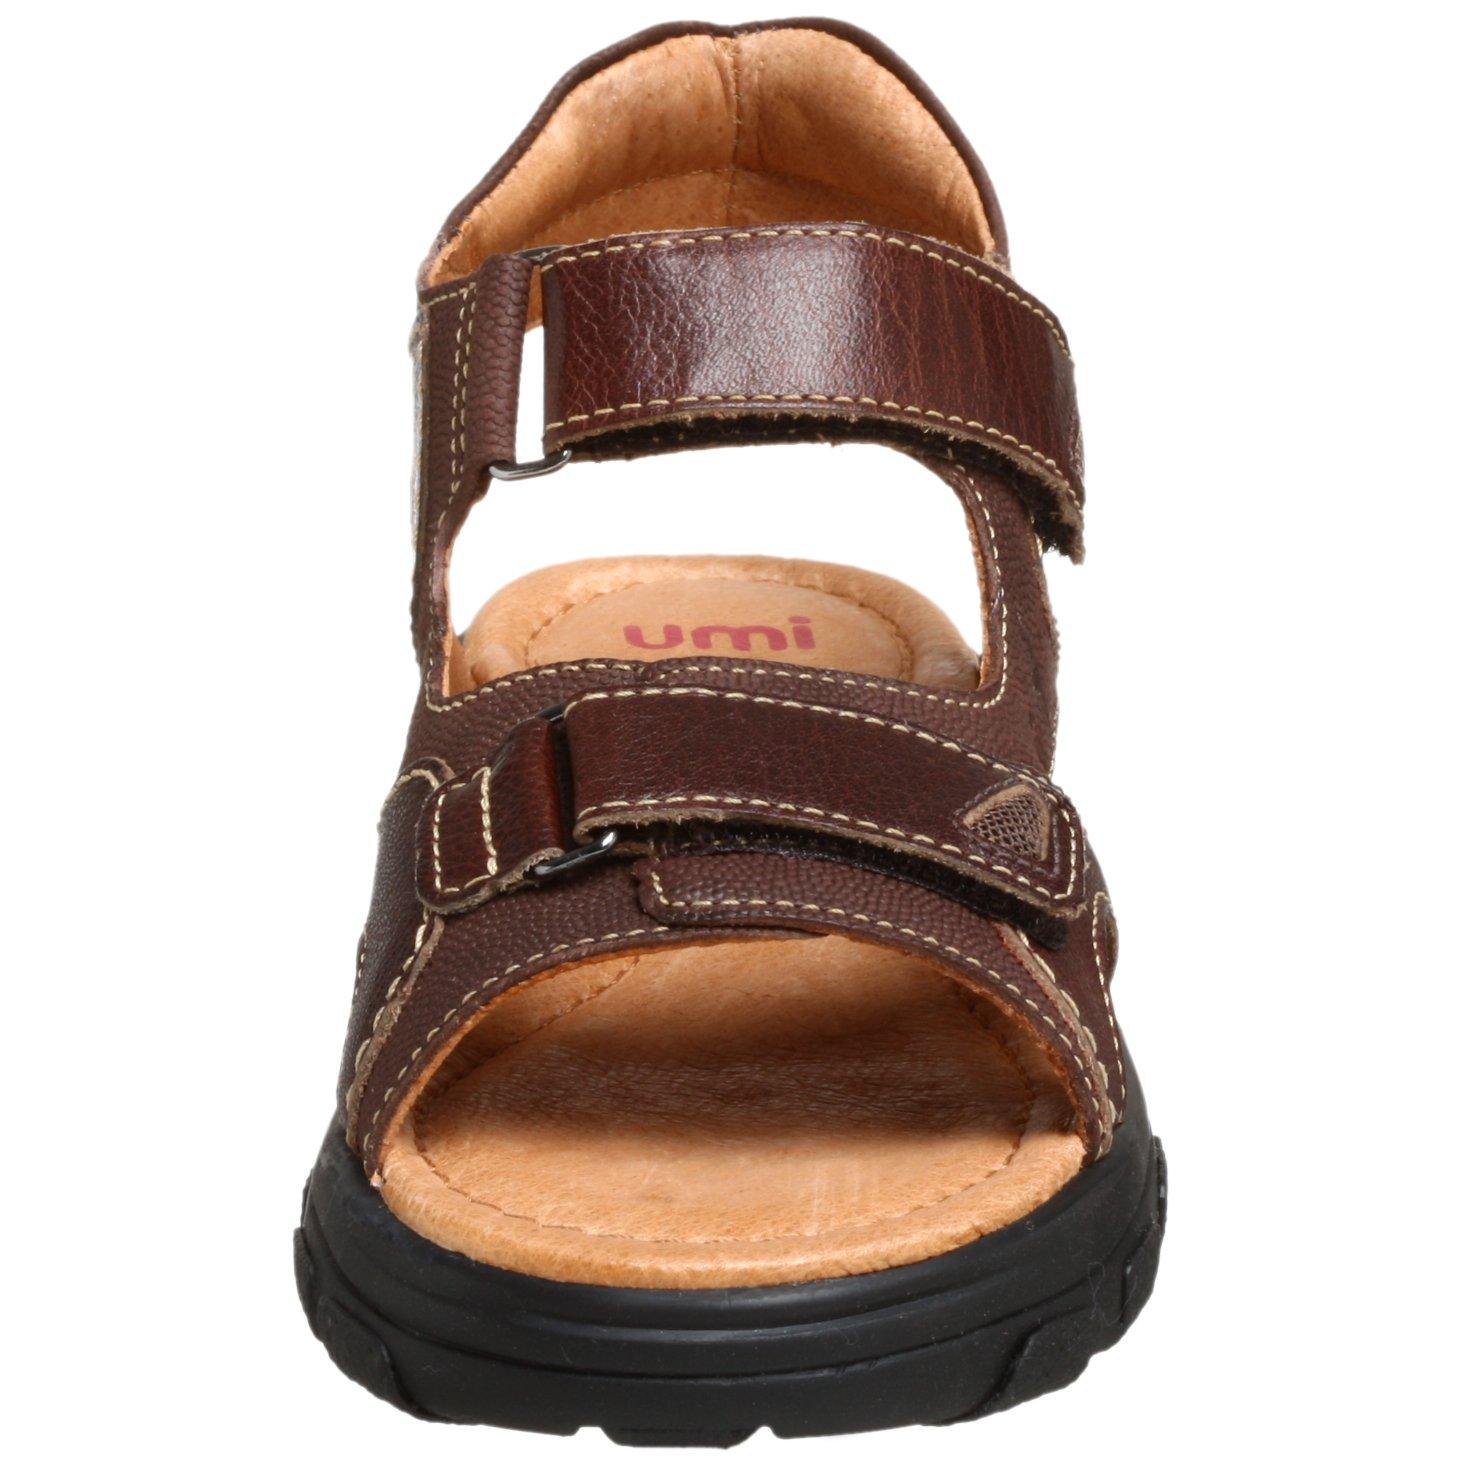 umi Toddler//Little Kid Wallaroo Sandal